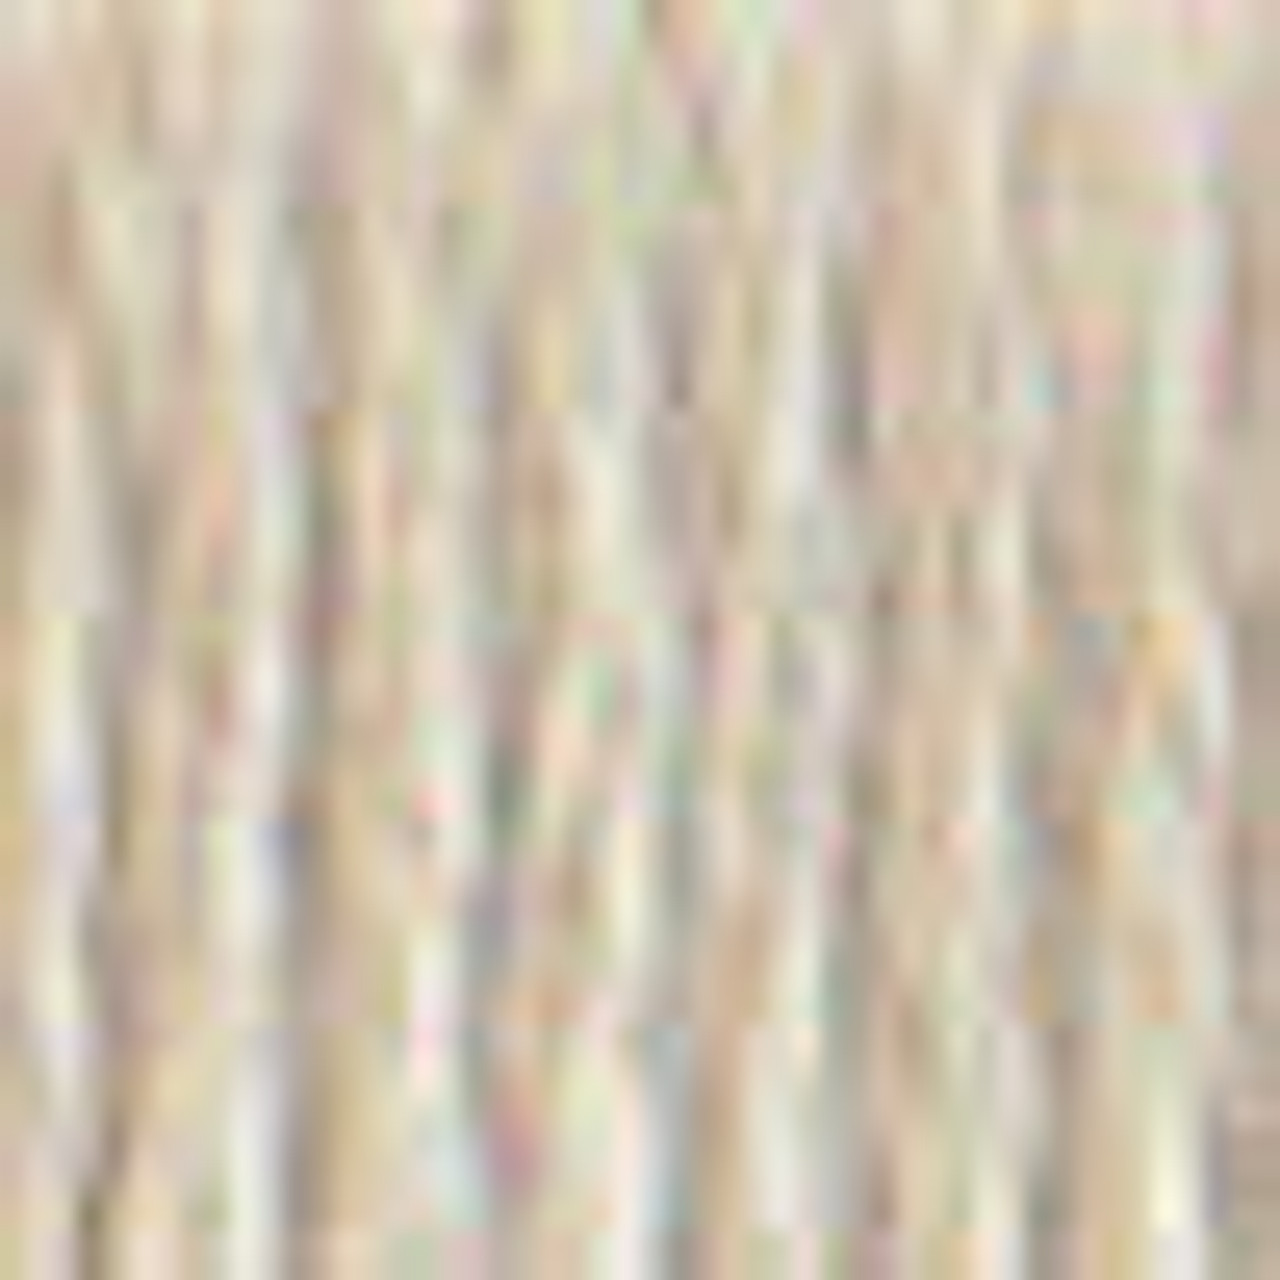 DMC # 3866 Ultra Vy Lt Mocha Brown  Floss / Thread